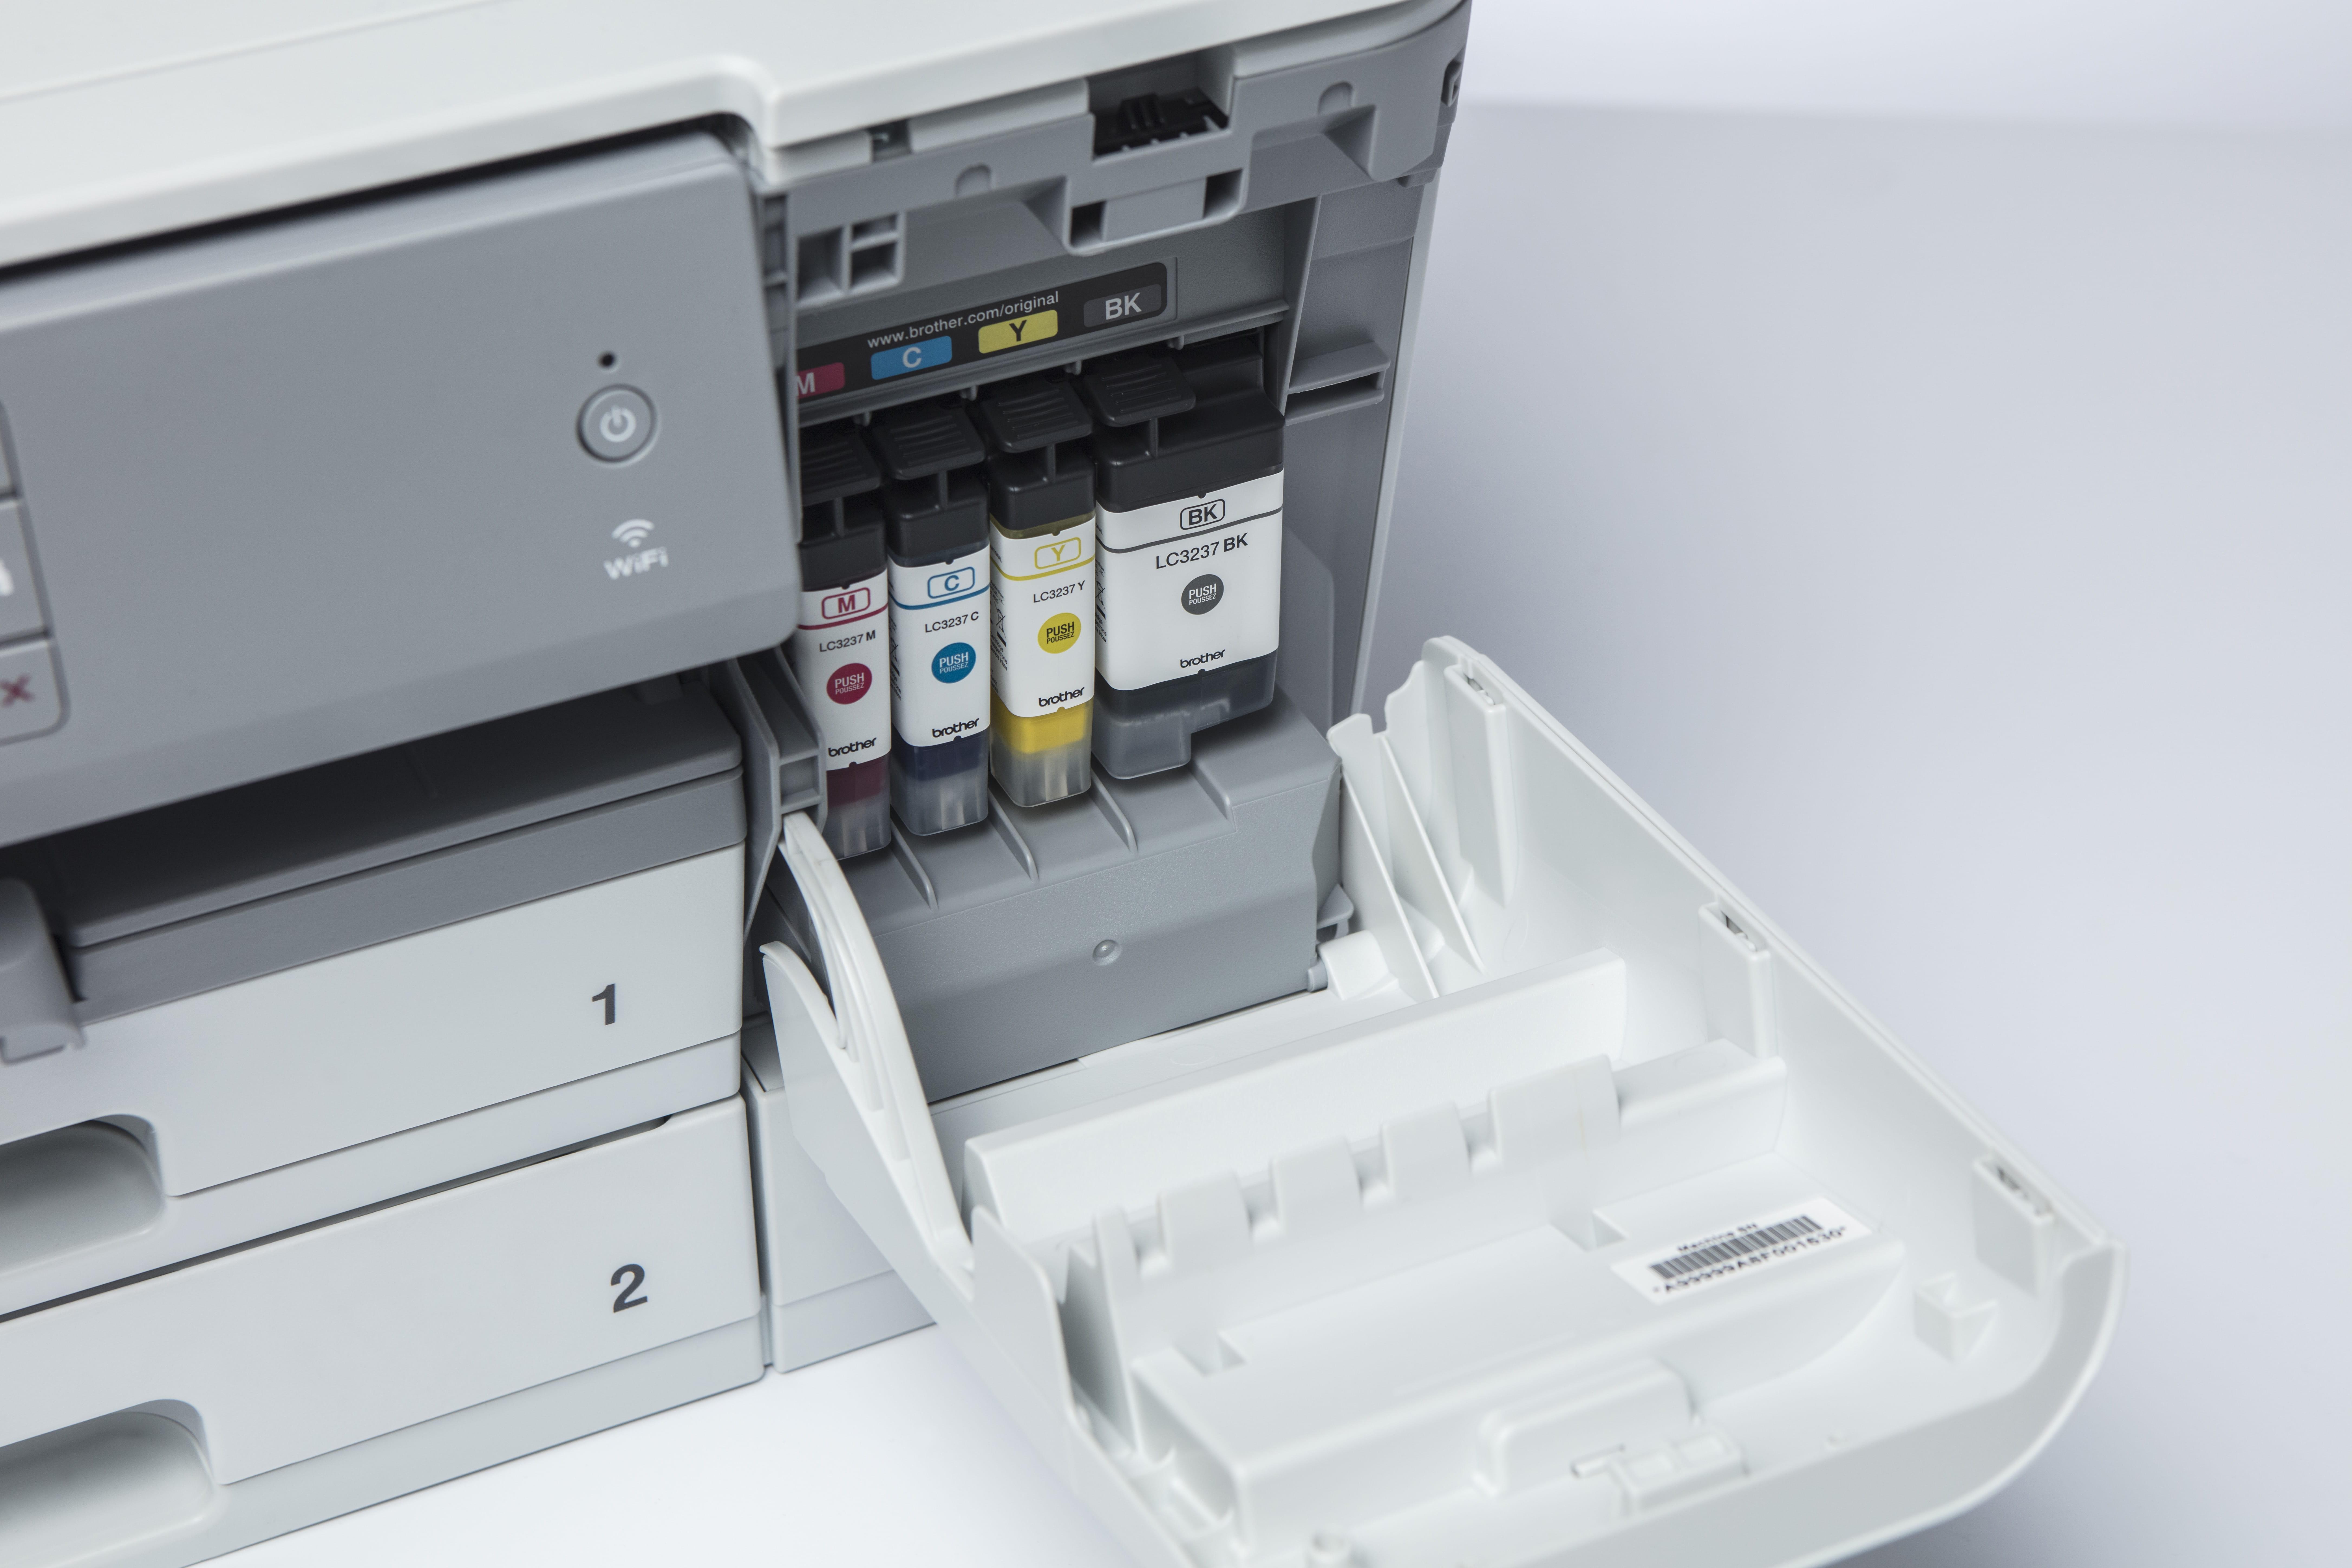 Blekkpatroner installert i Brother HL J6000DW blekkskriver